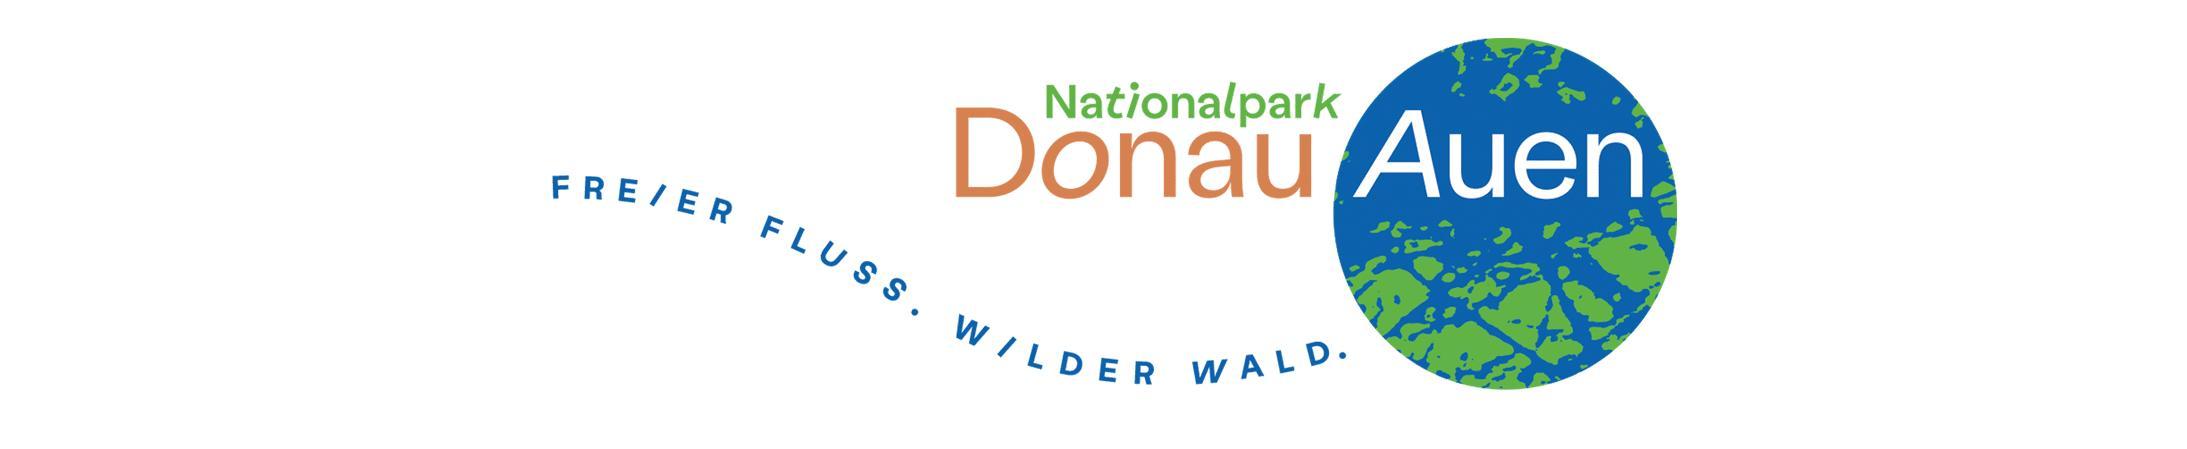 NPDonauAuen Logo